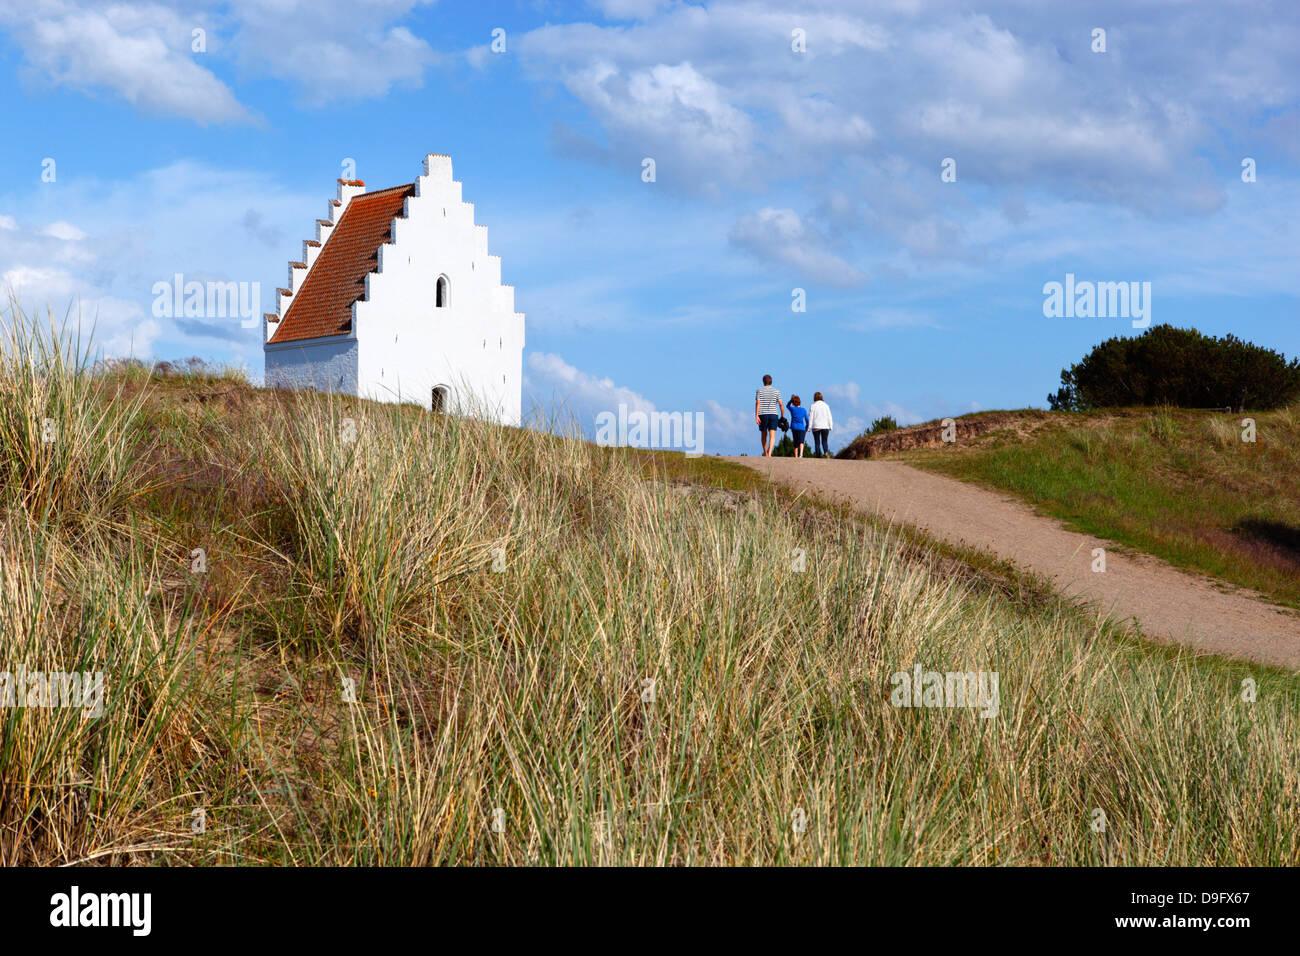 Tower of Den Tilsandede Kirke (Buried Church) buried by sand drifts, Skagen, Jutland, Denmark, Scandinavia - Stock Image